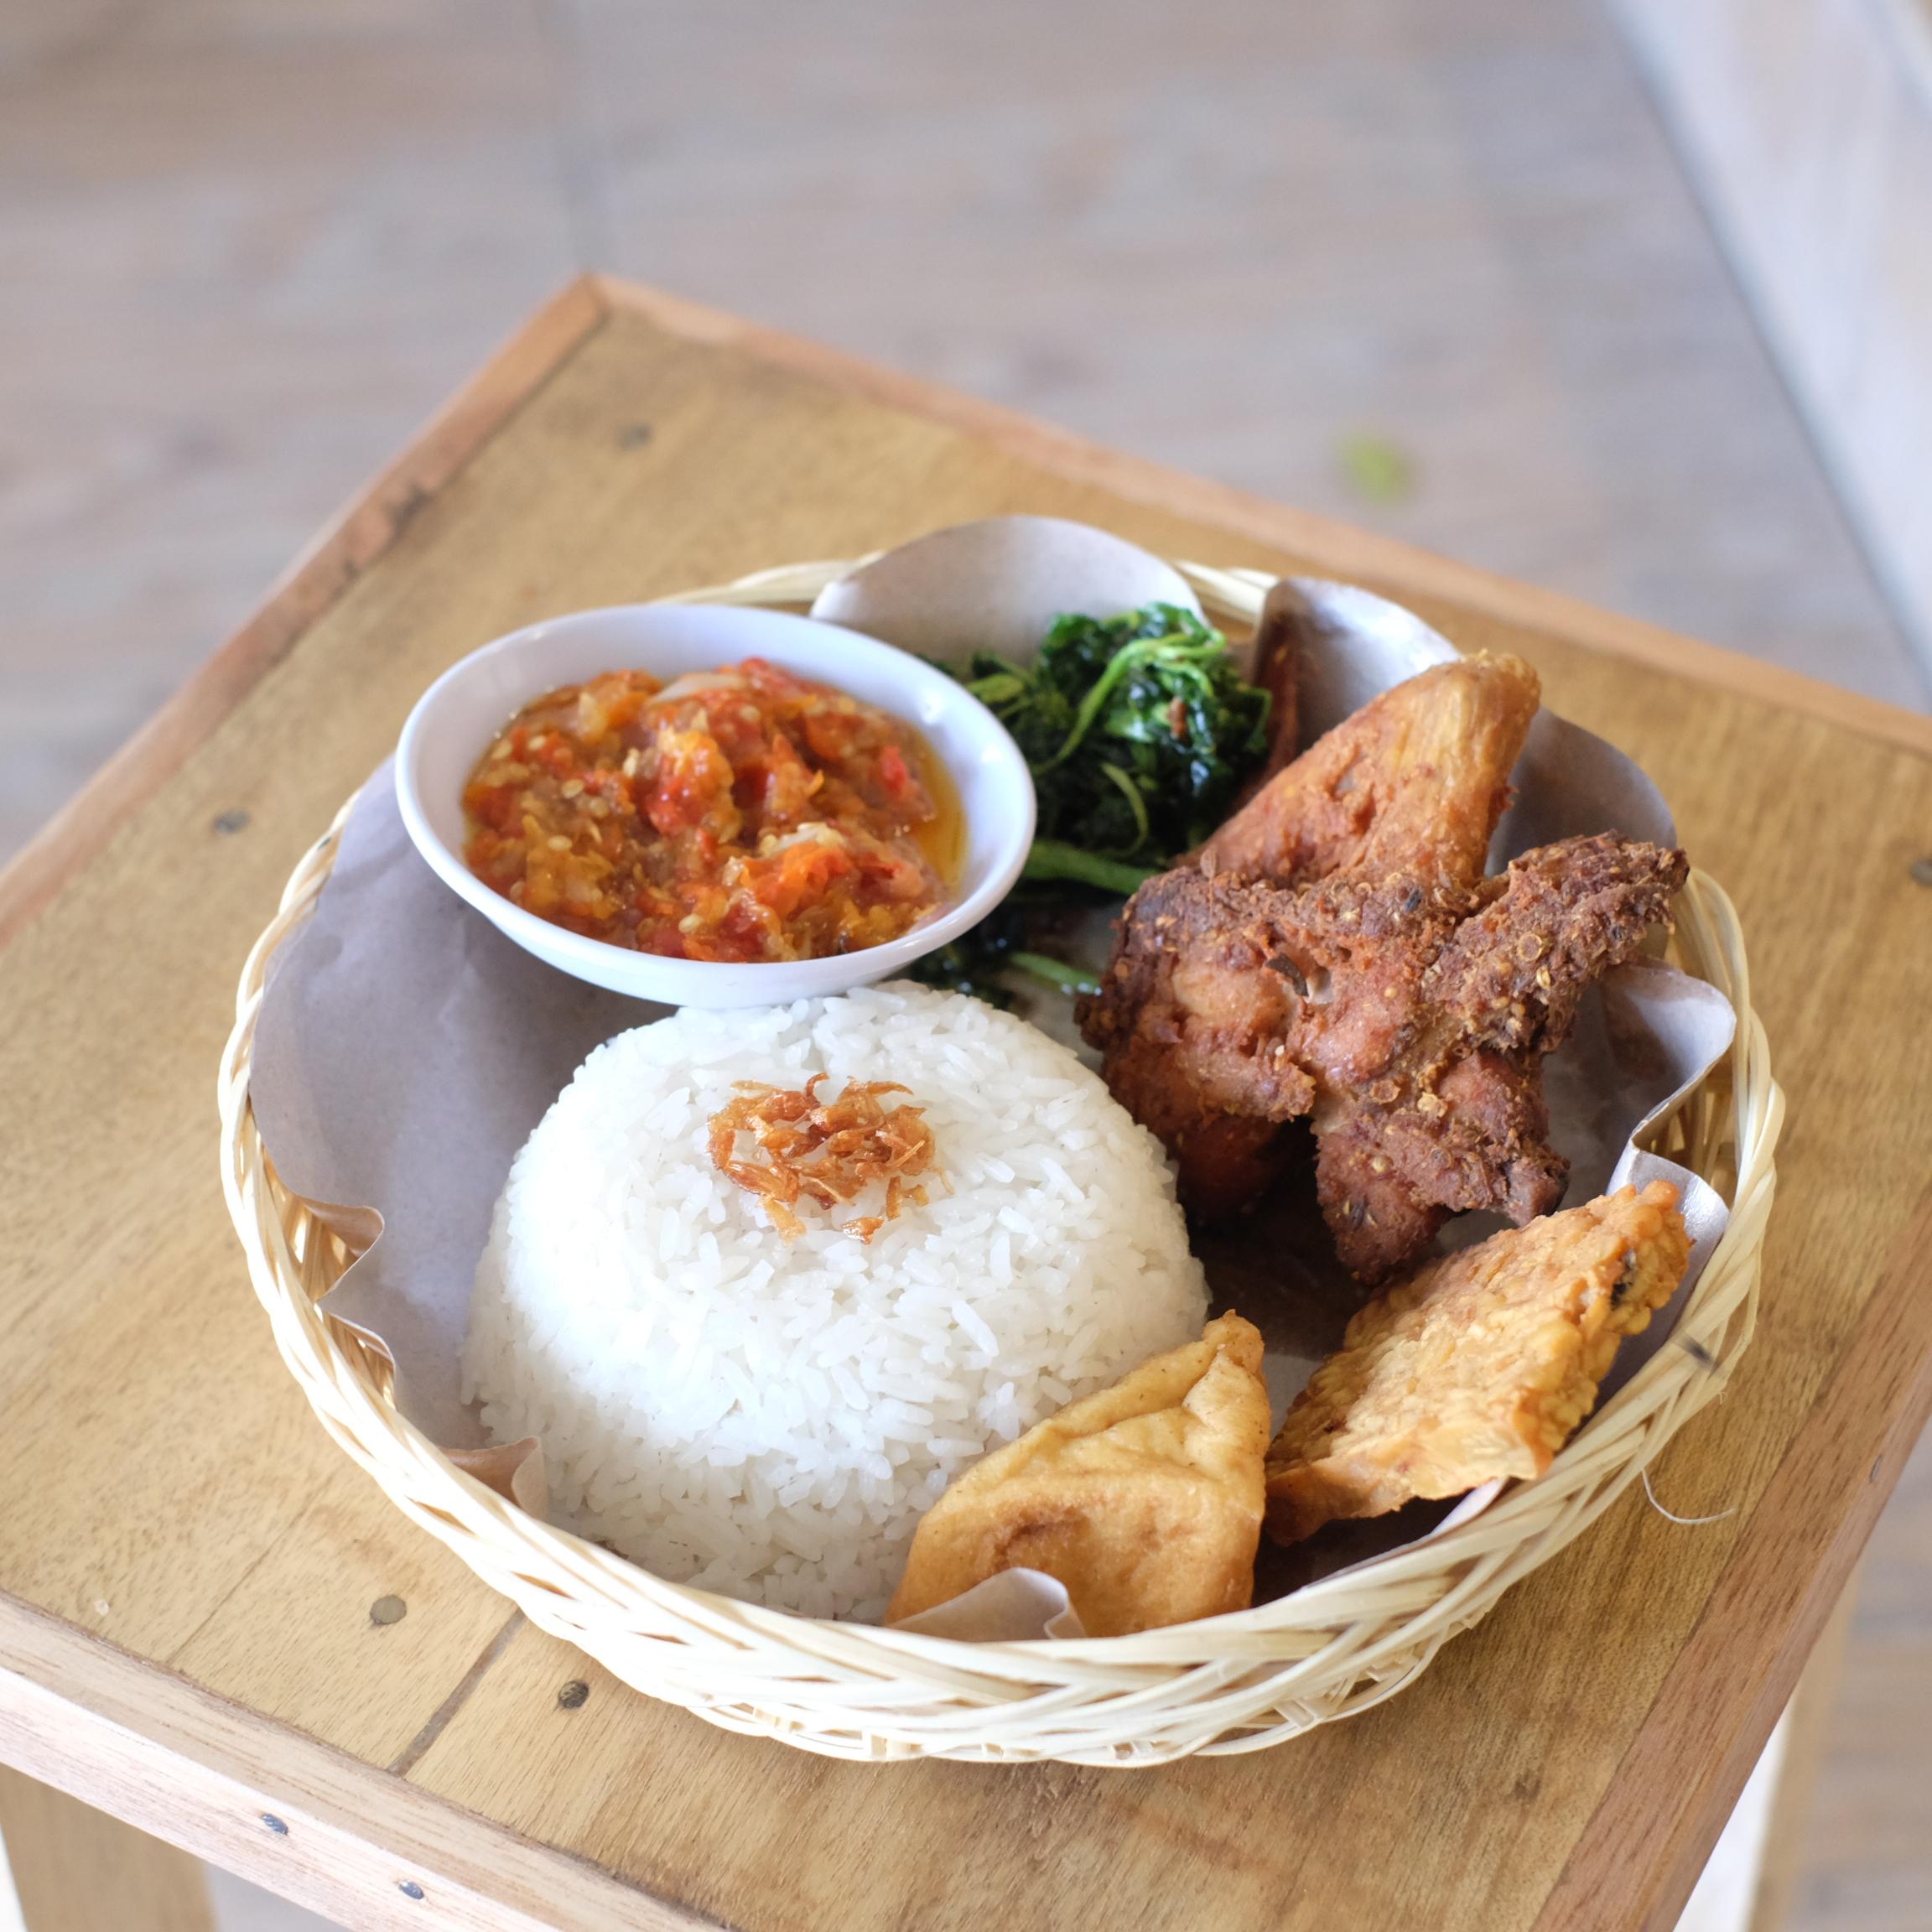 Waroeng bandoeng Bali, Dewi sri